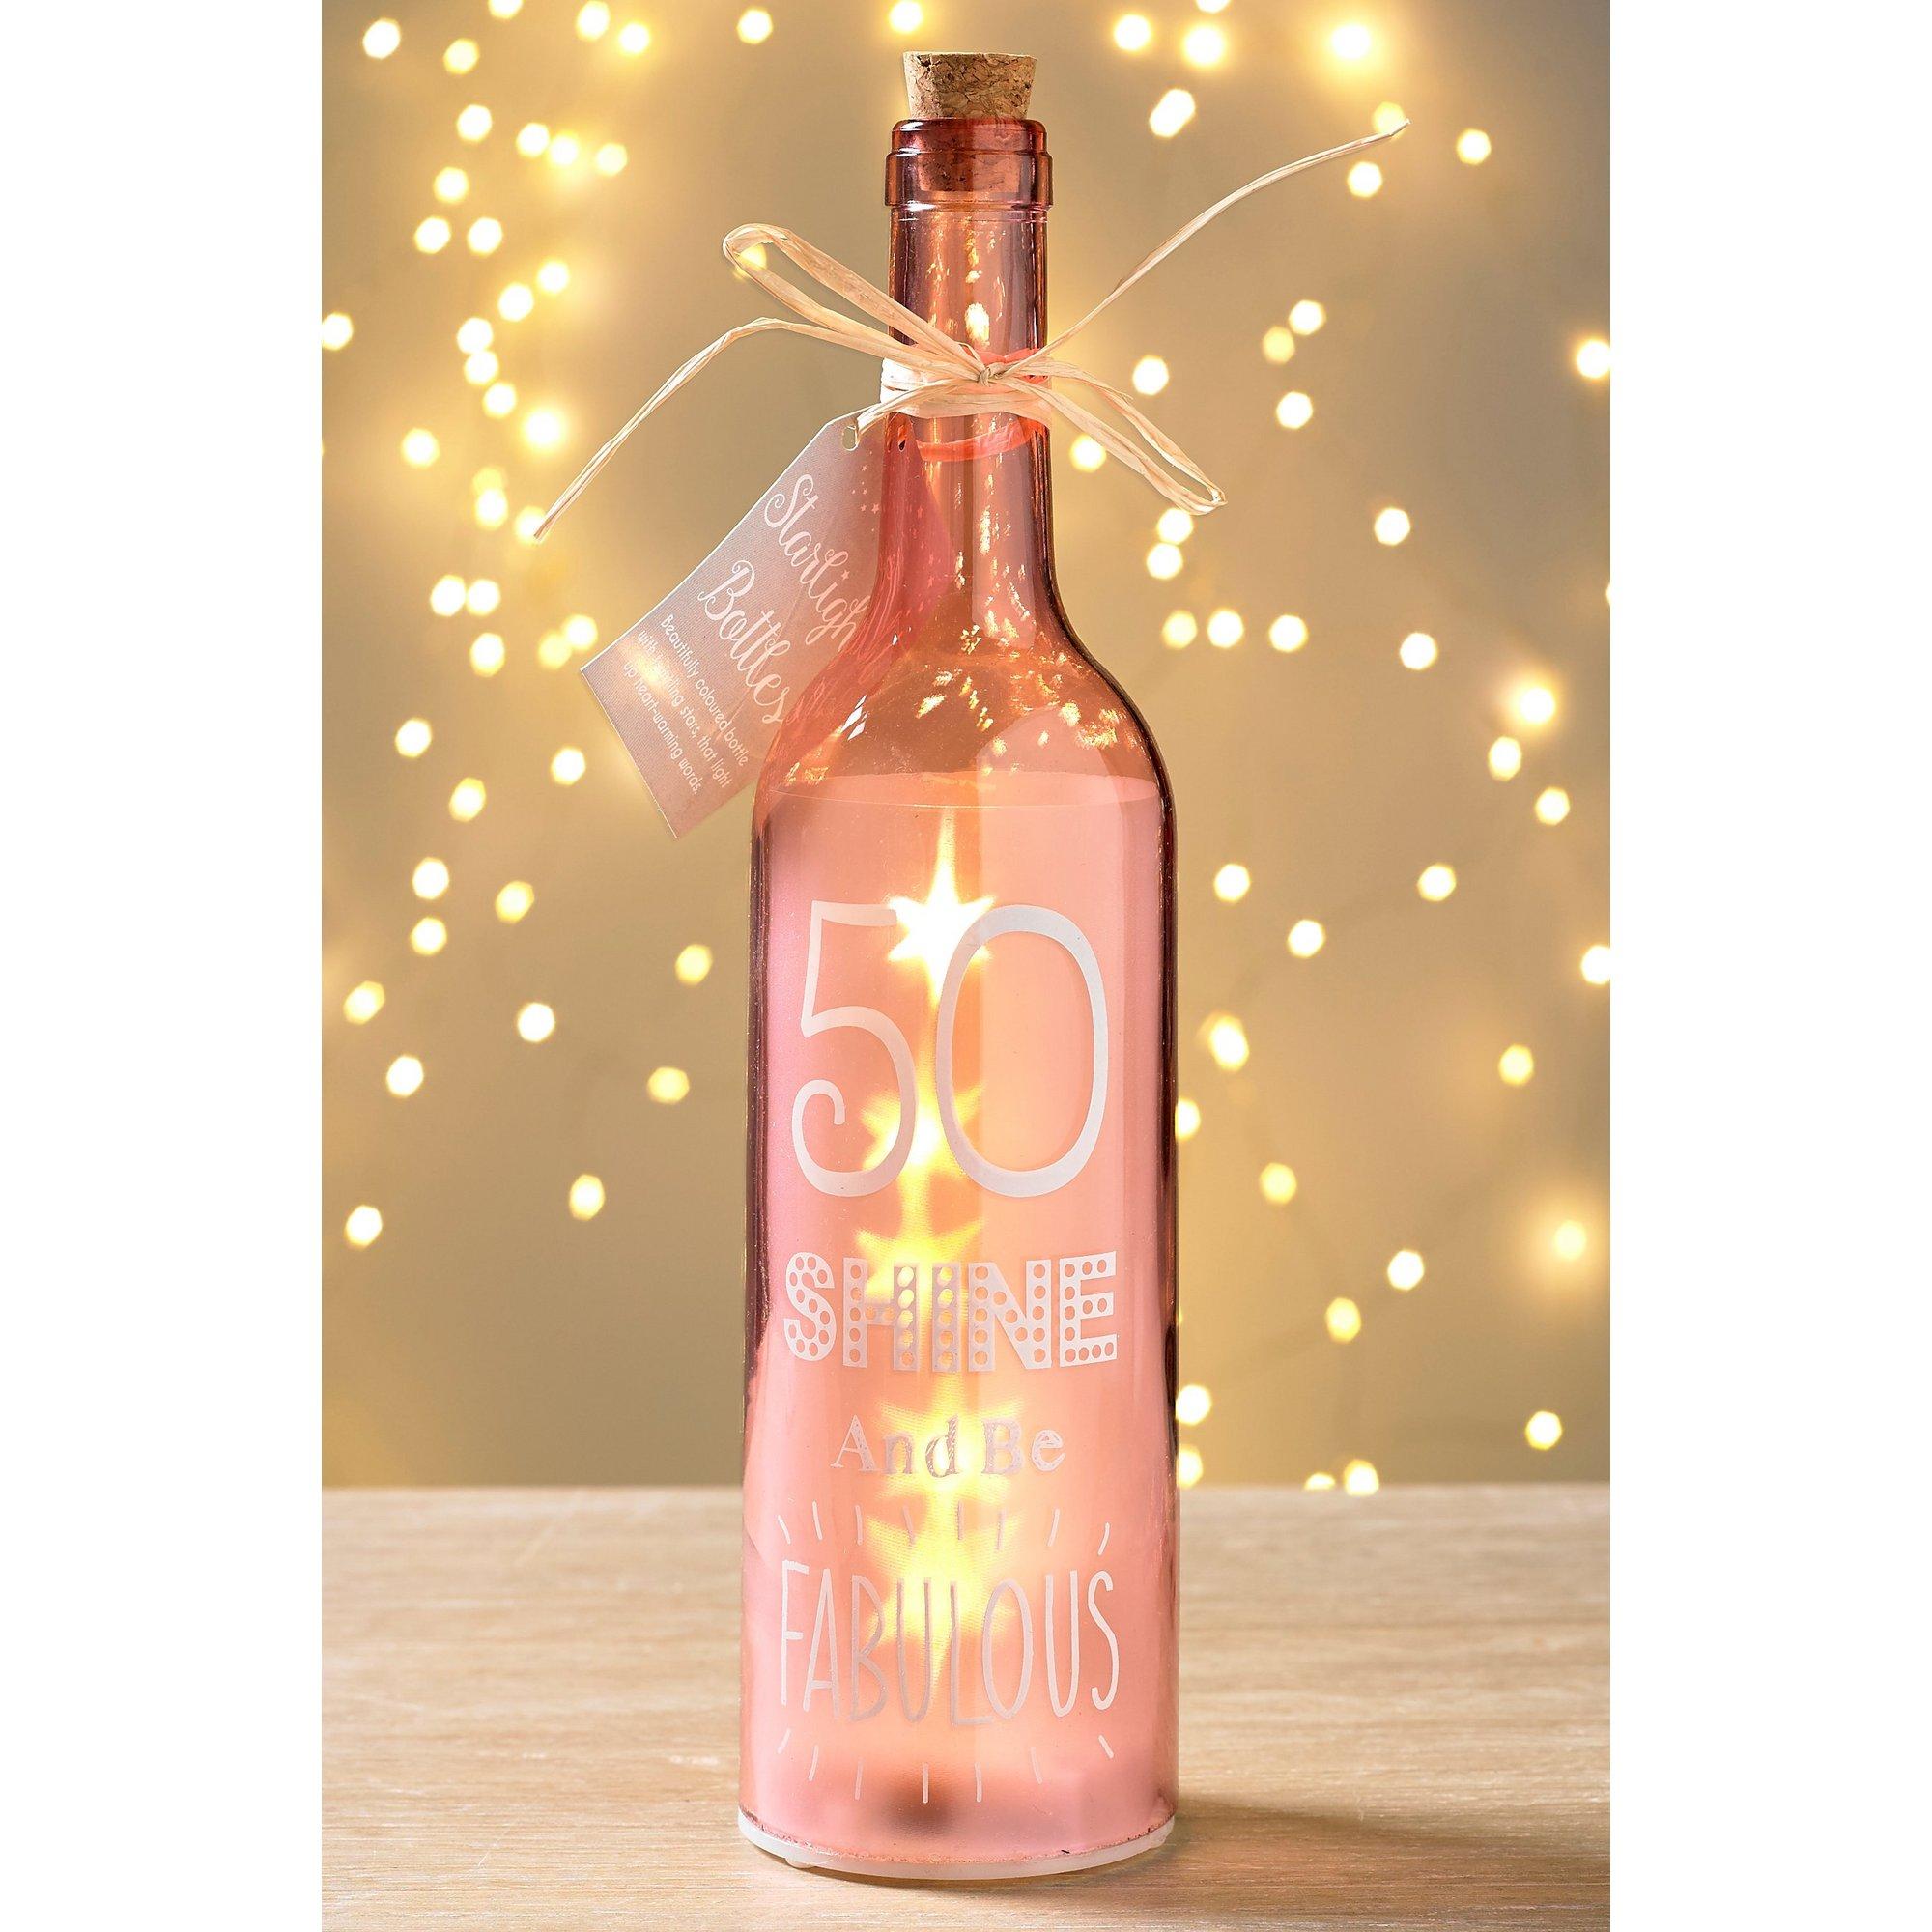 Image of 50th Birthday Starlight Bottle